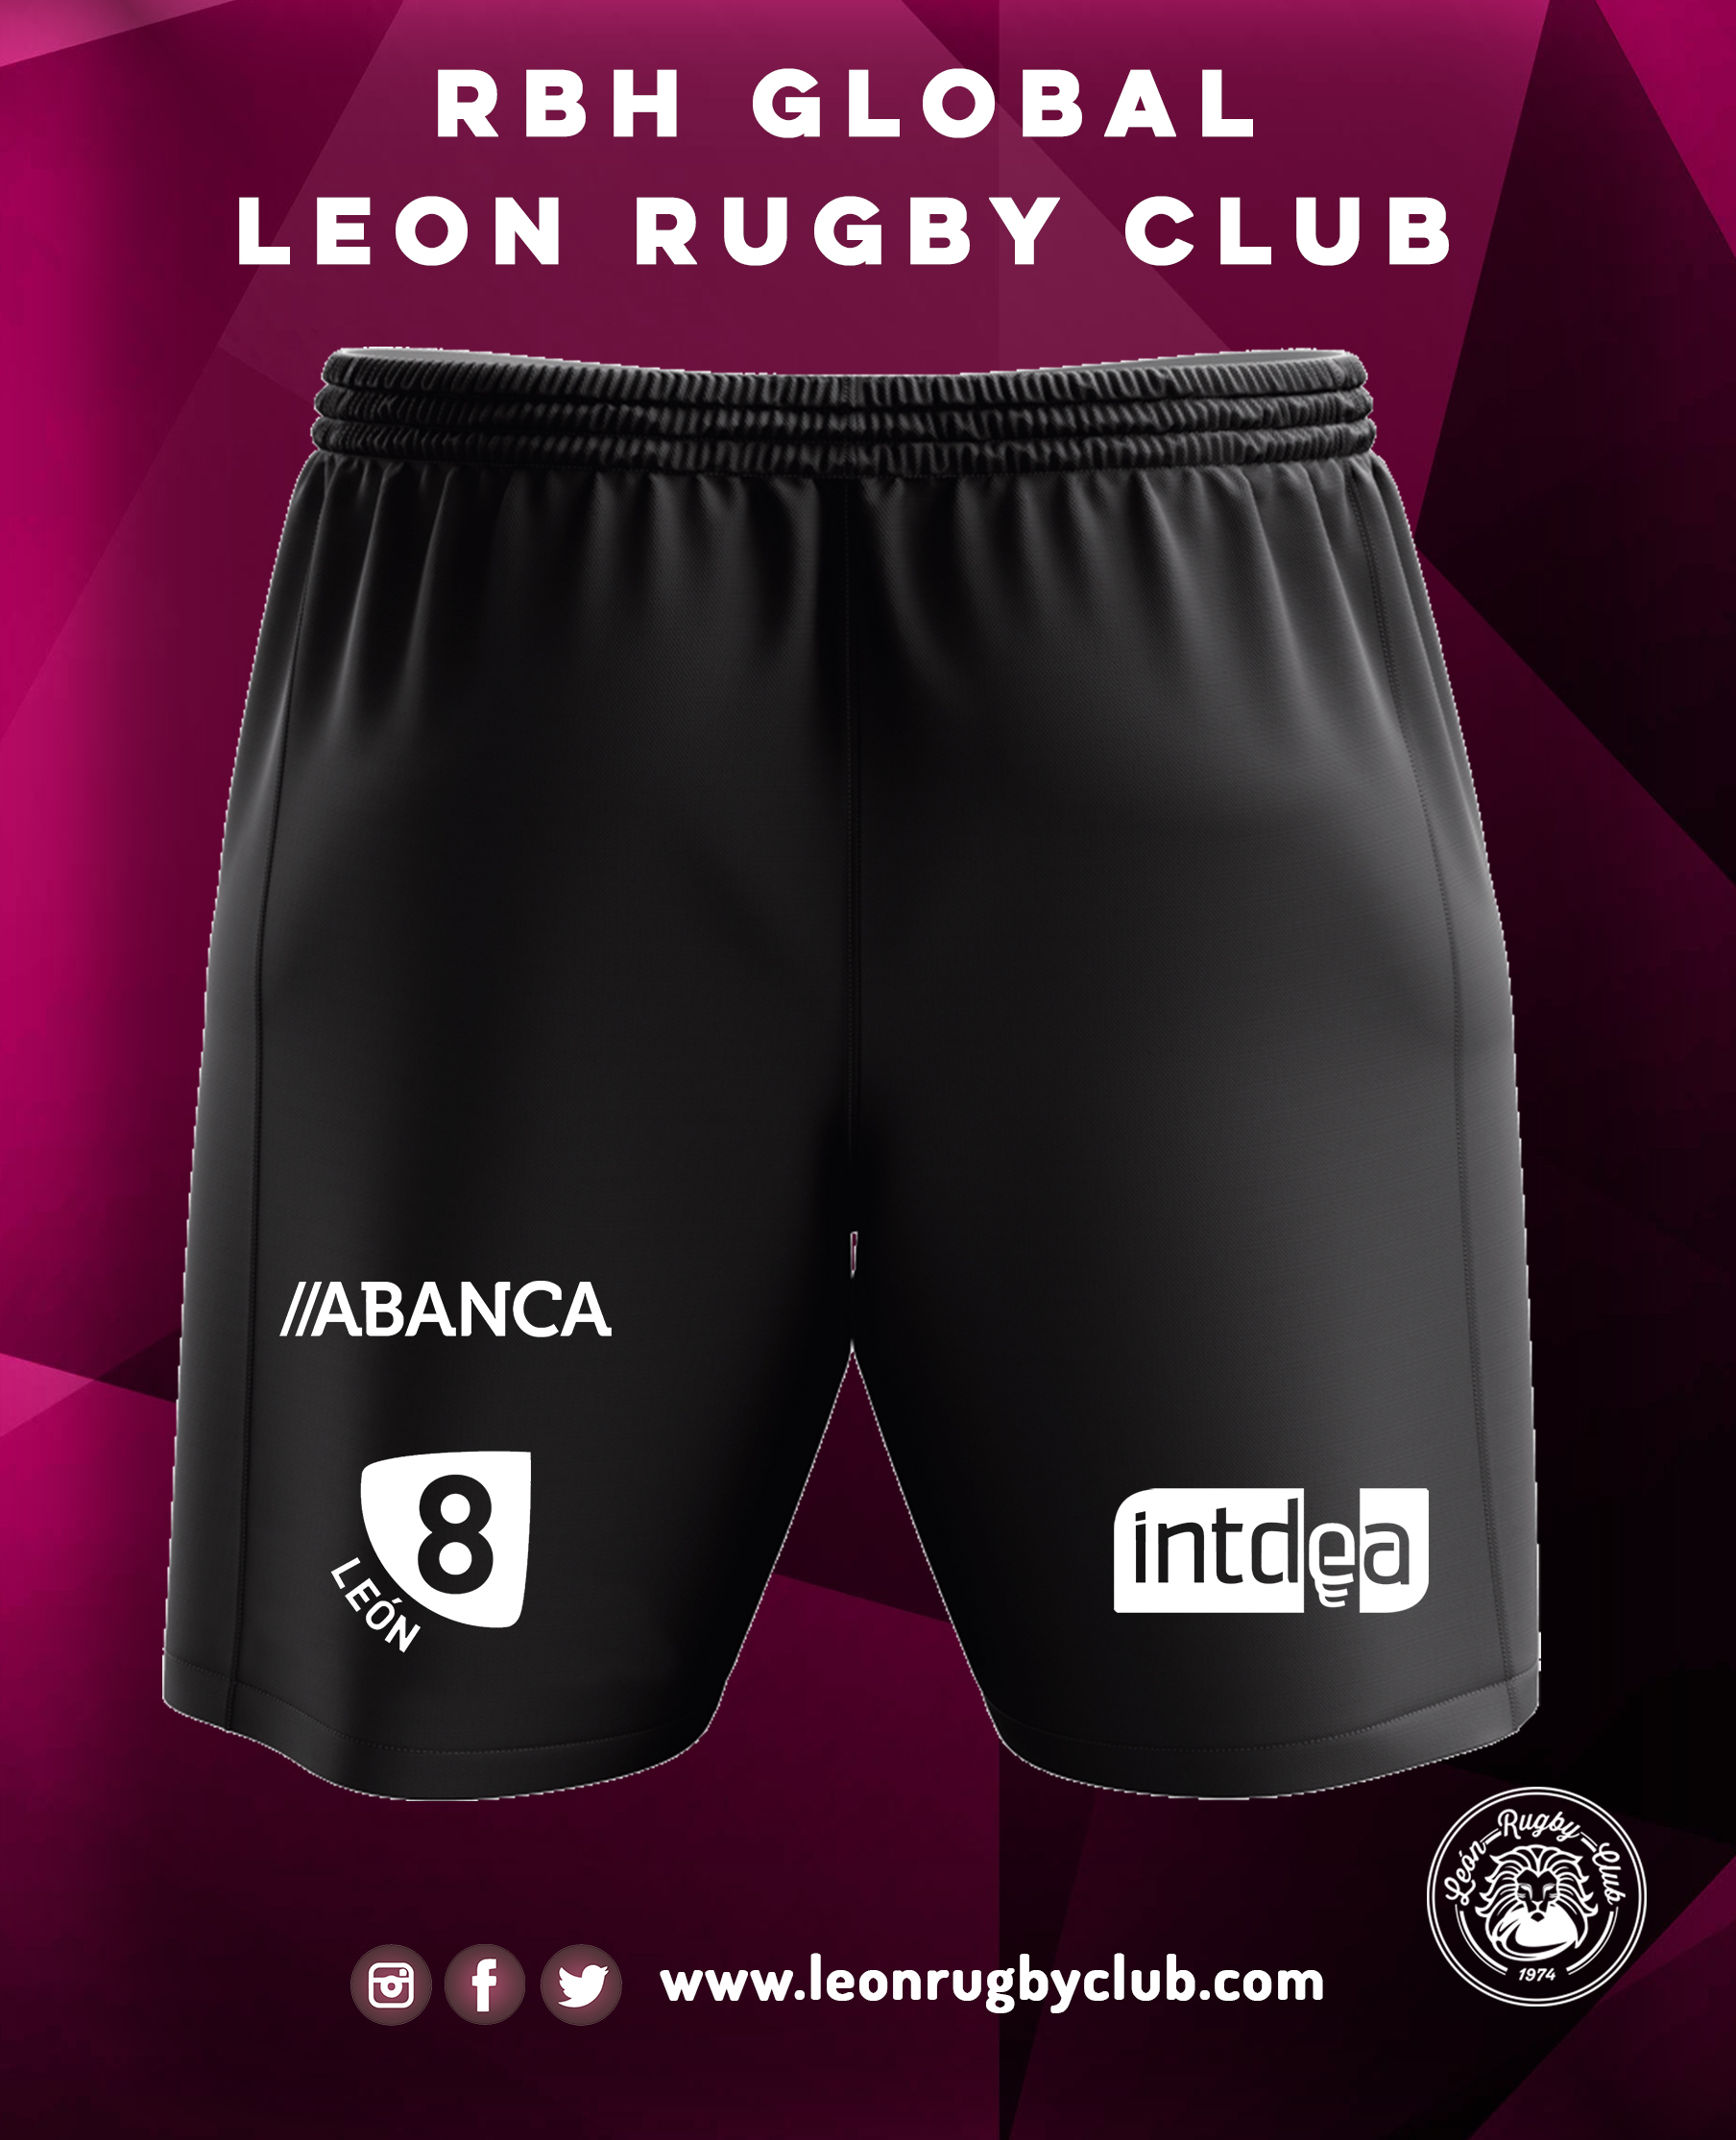 Pantalón negro corto de Rugby RBH Global León Rugby Club 19-20 2